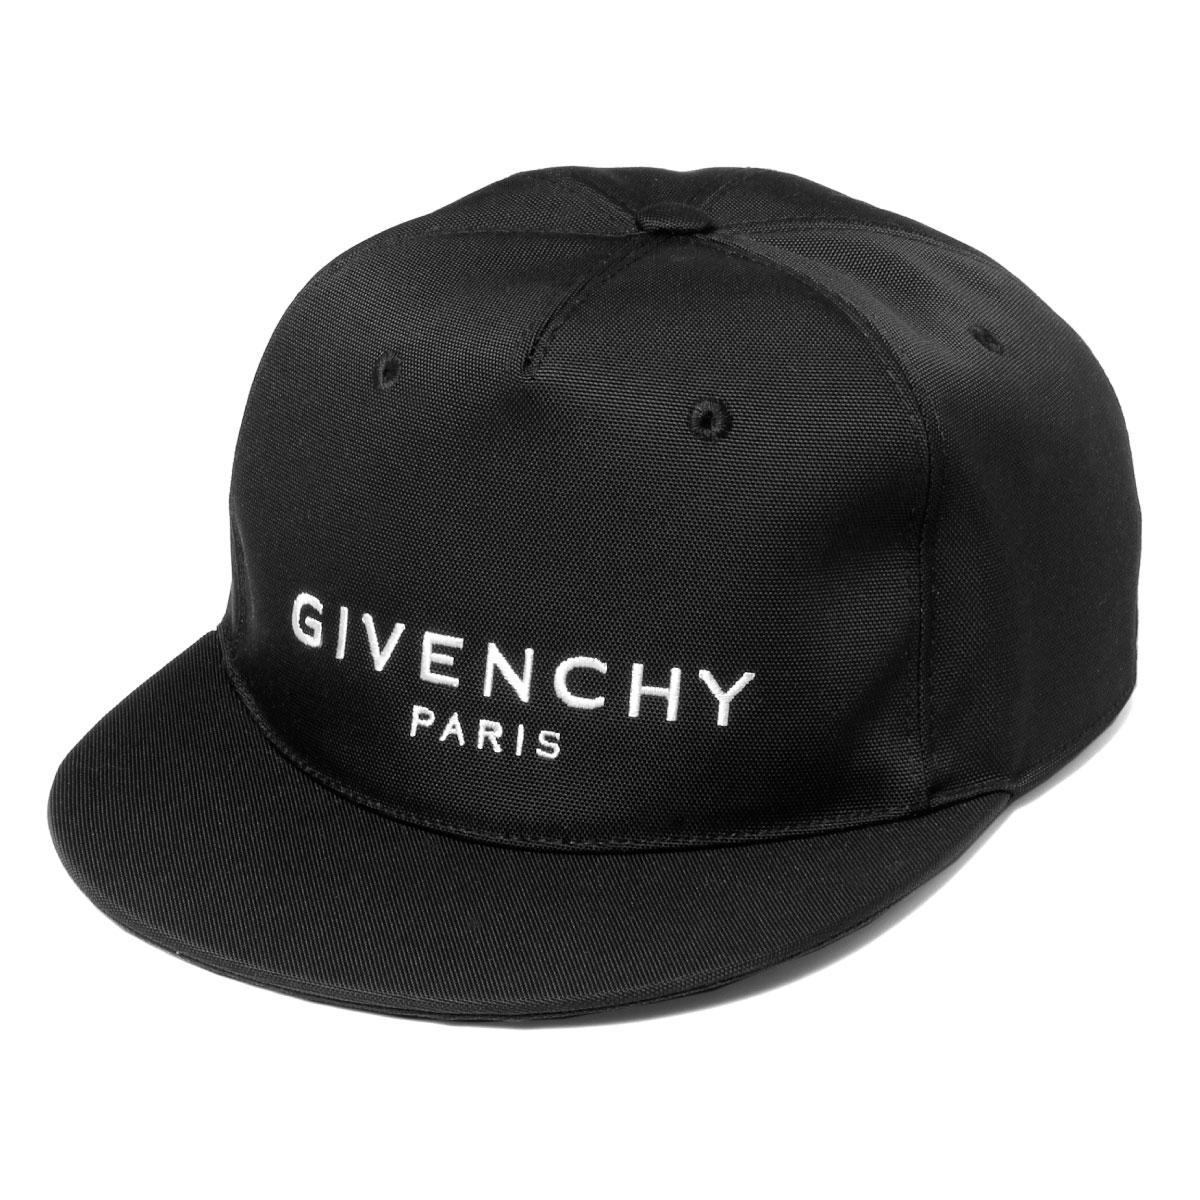 1ed81ad5811 importshopdouble  Givenchy GIVENCHY cap men BPZ001K0CE 001 BLACK ...